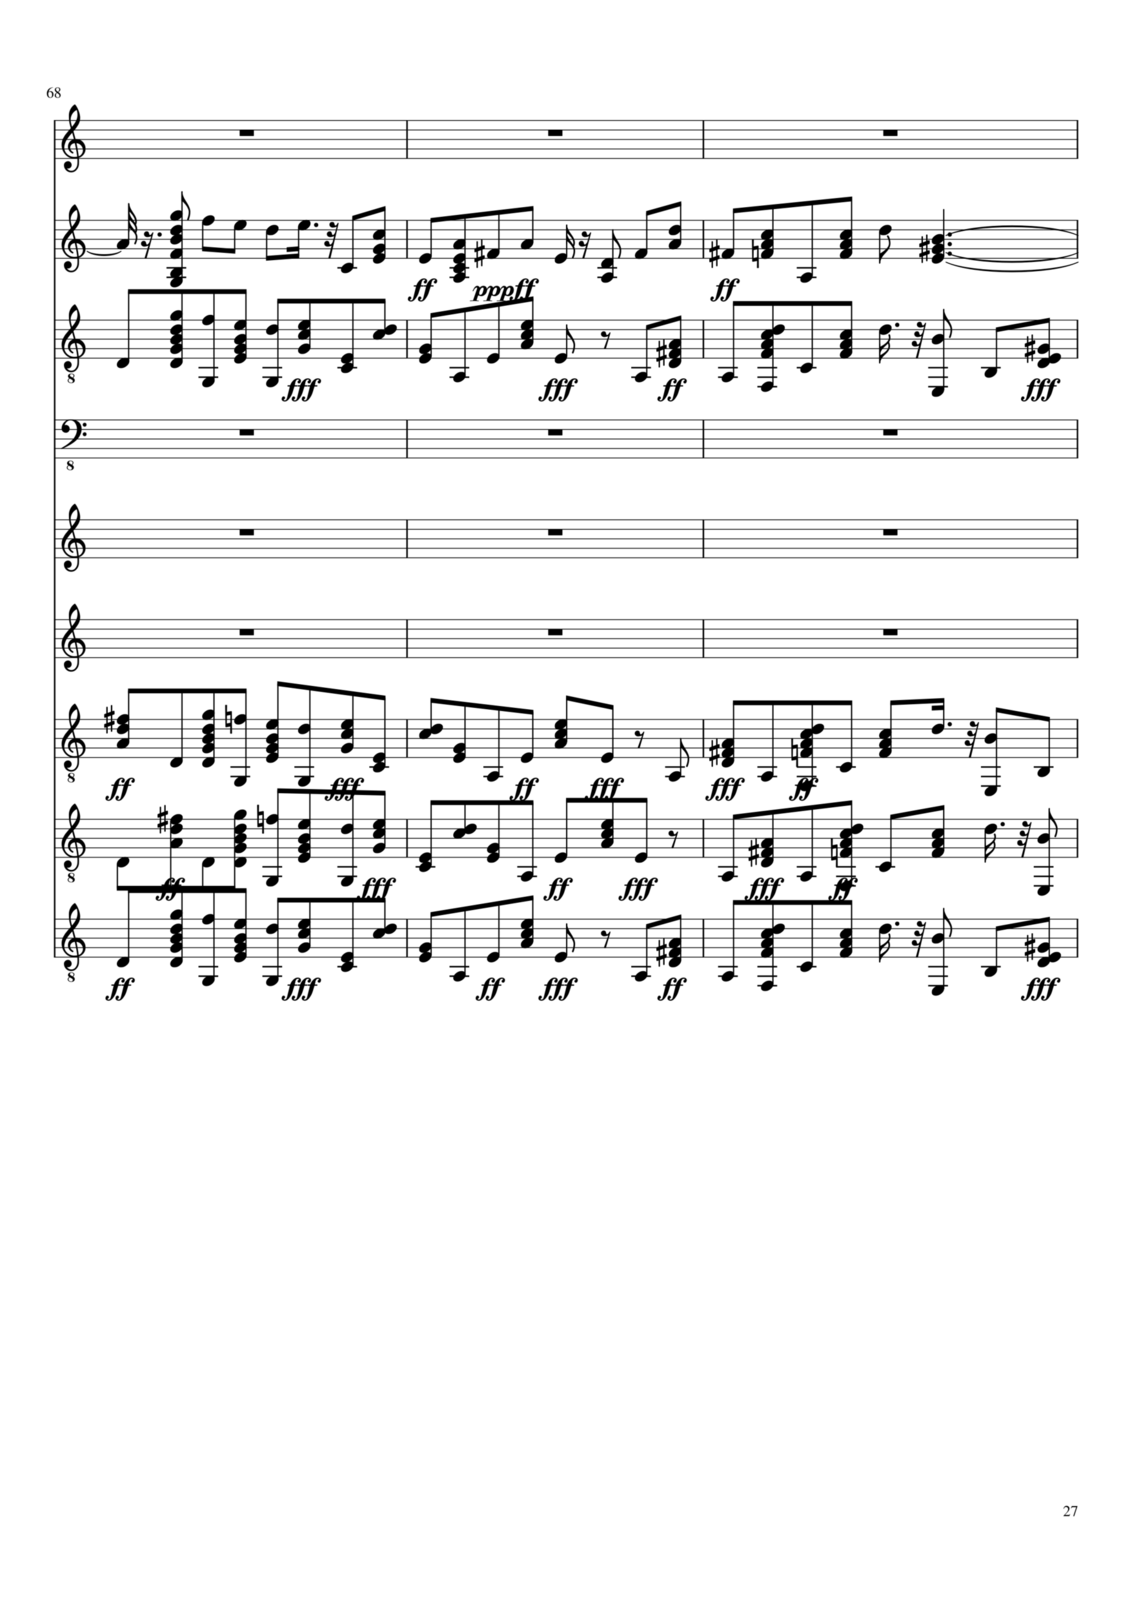 18 berez slide, Image 27